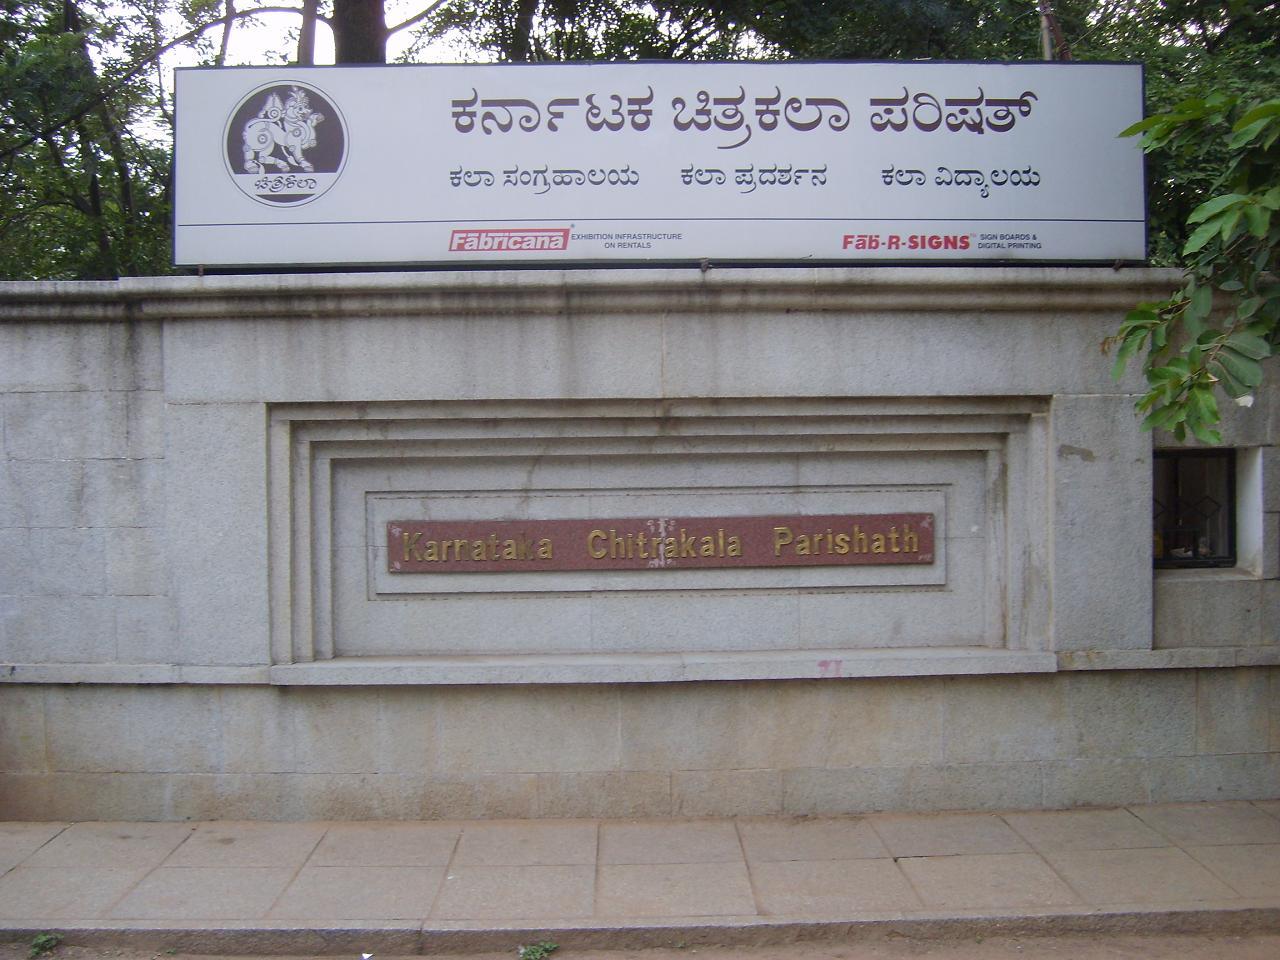 Картинная Галерея  в Карнатака